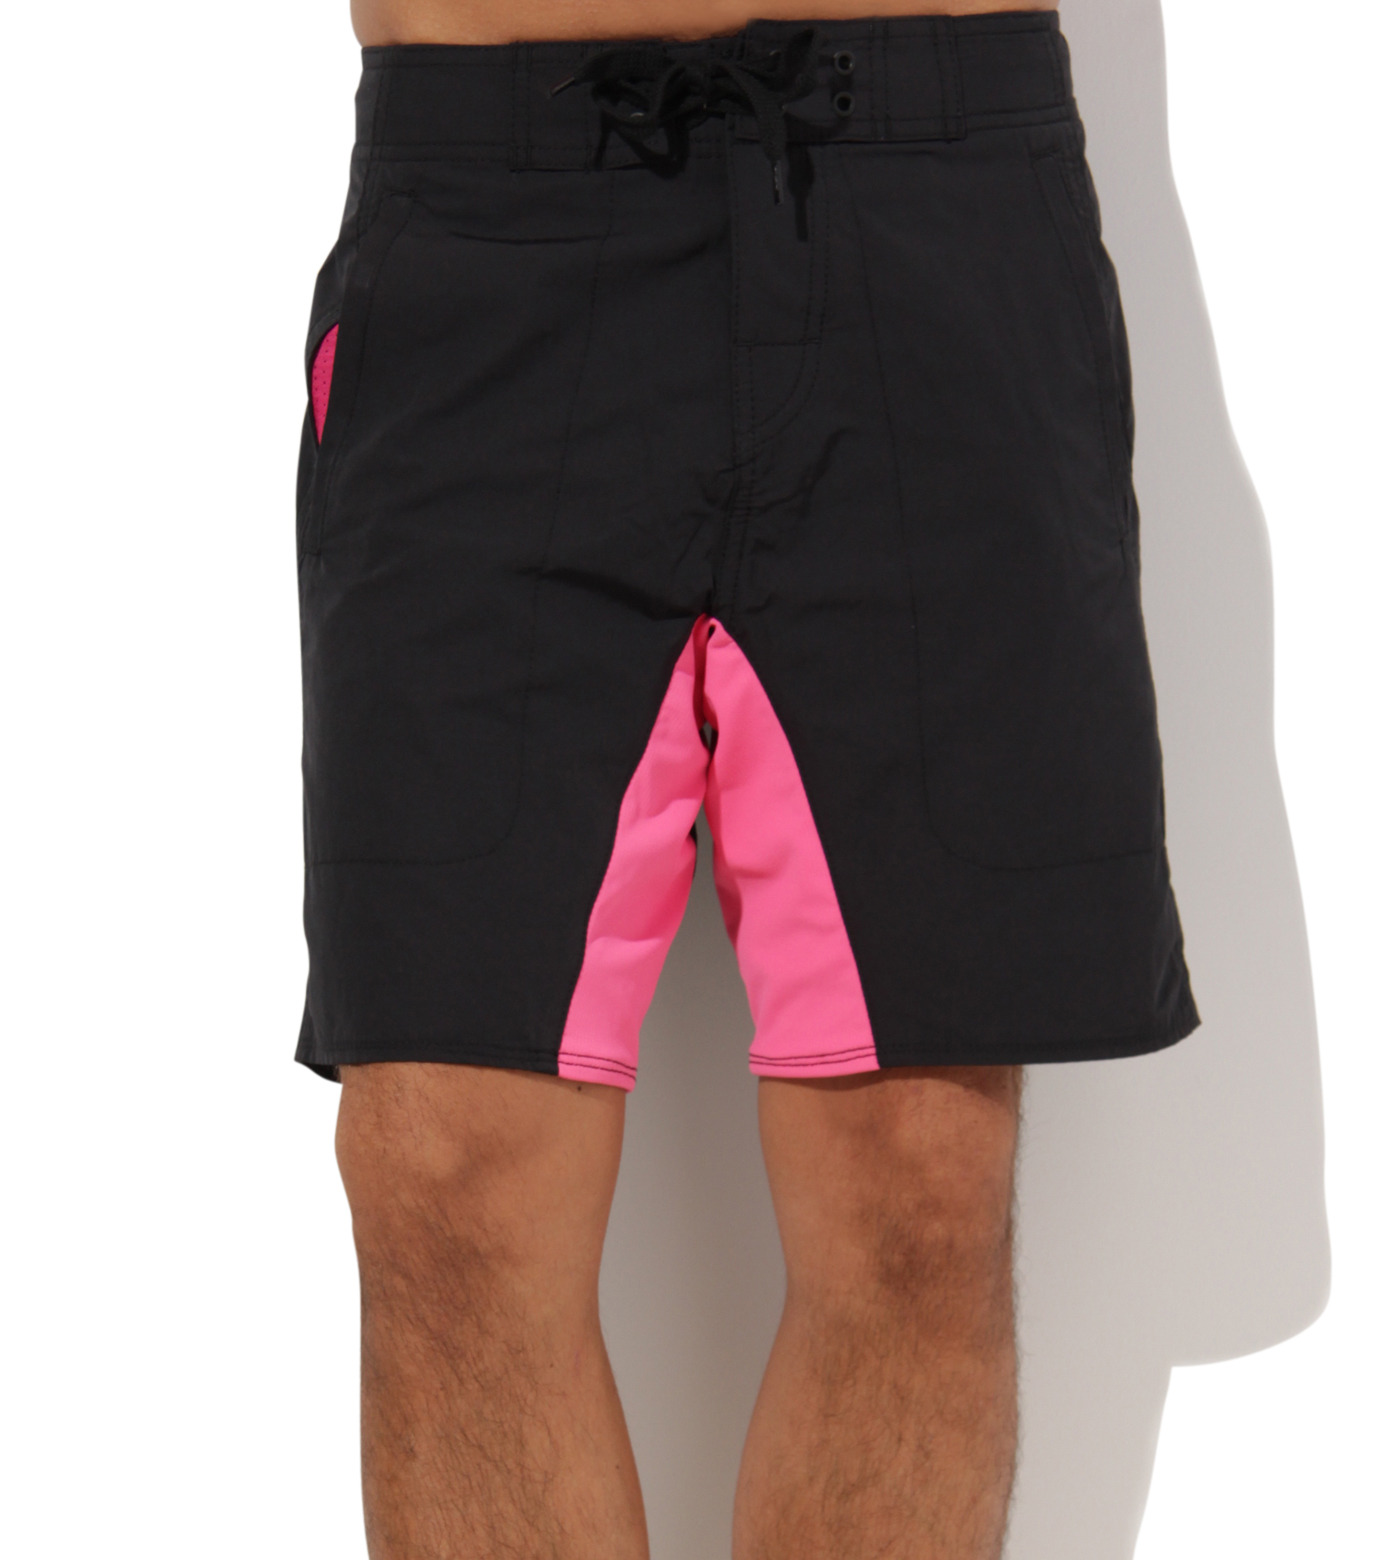 TWO TWO ONE(トゥートゥーワン)のSurf shorts short-PINK(SWIMWEAR/SWIMWEAR)-15N948001-72 拡大詳細画像3